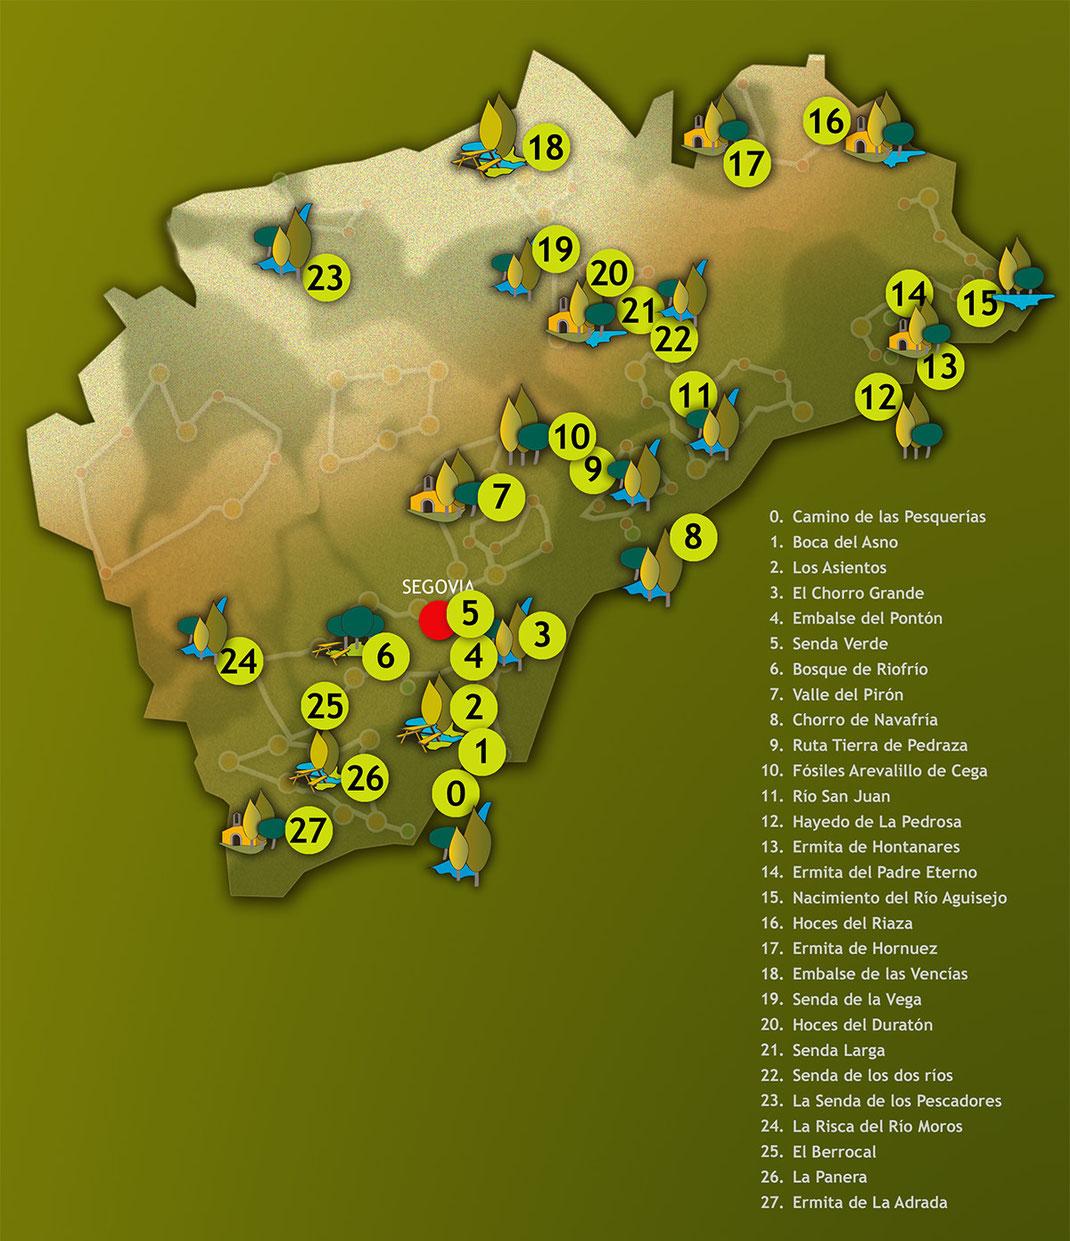 Espacios naturales de la provincia de Segovia